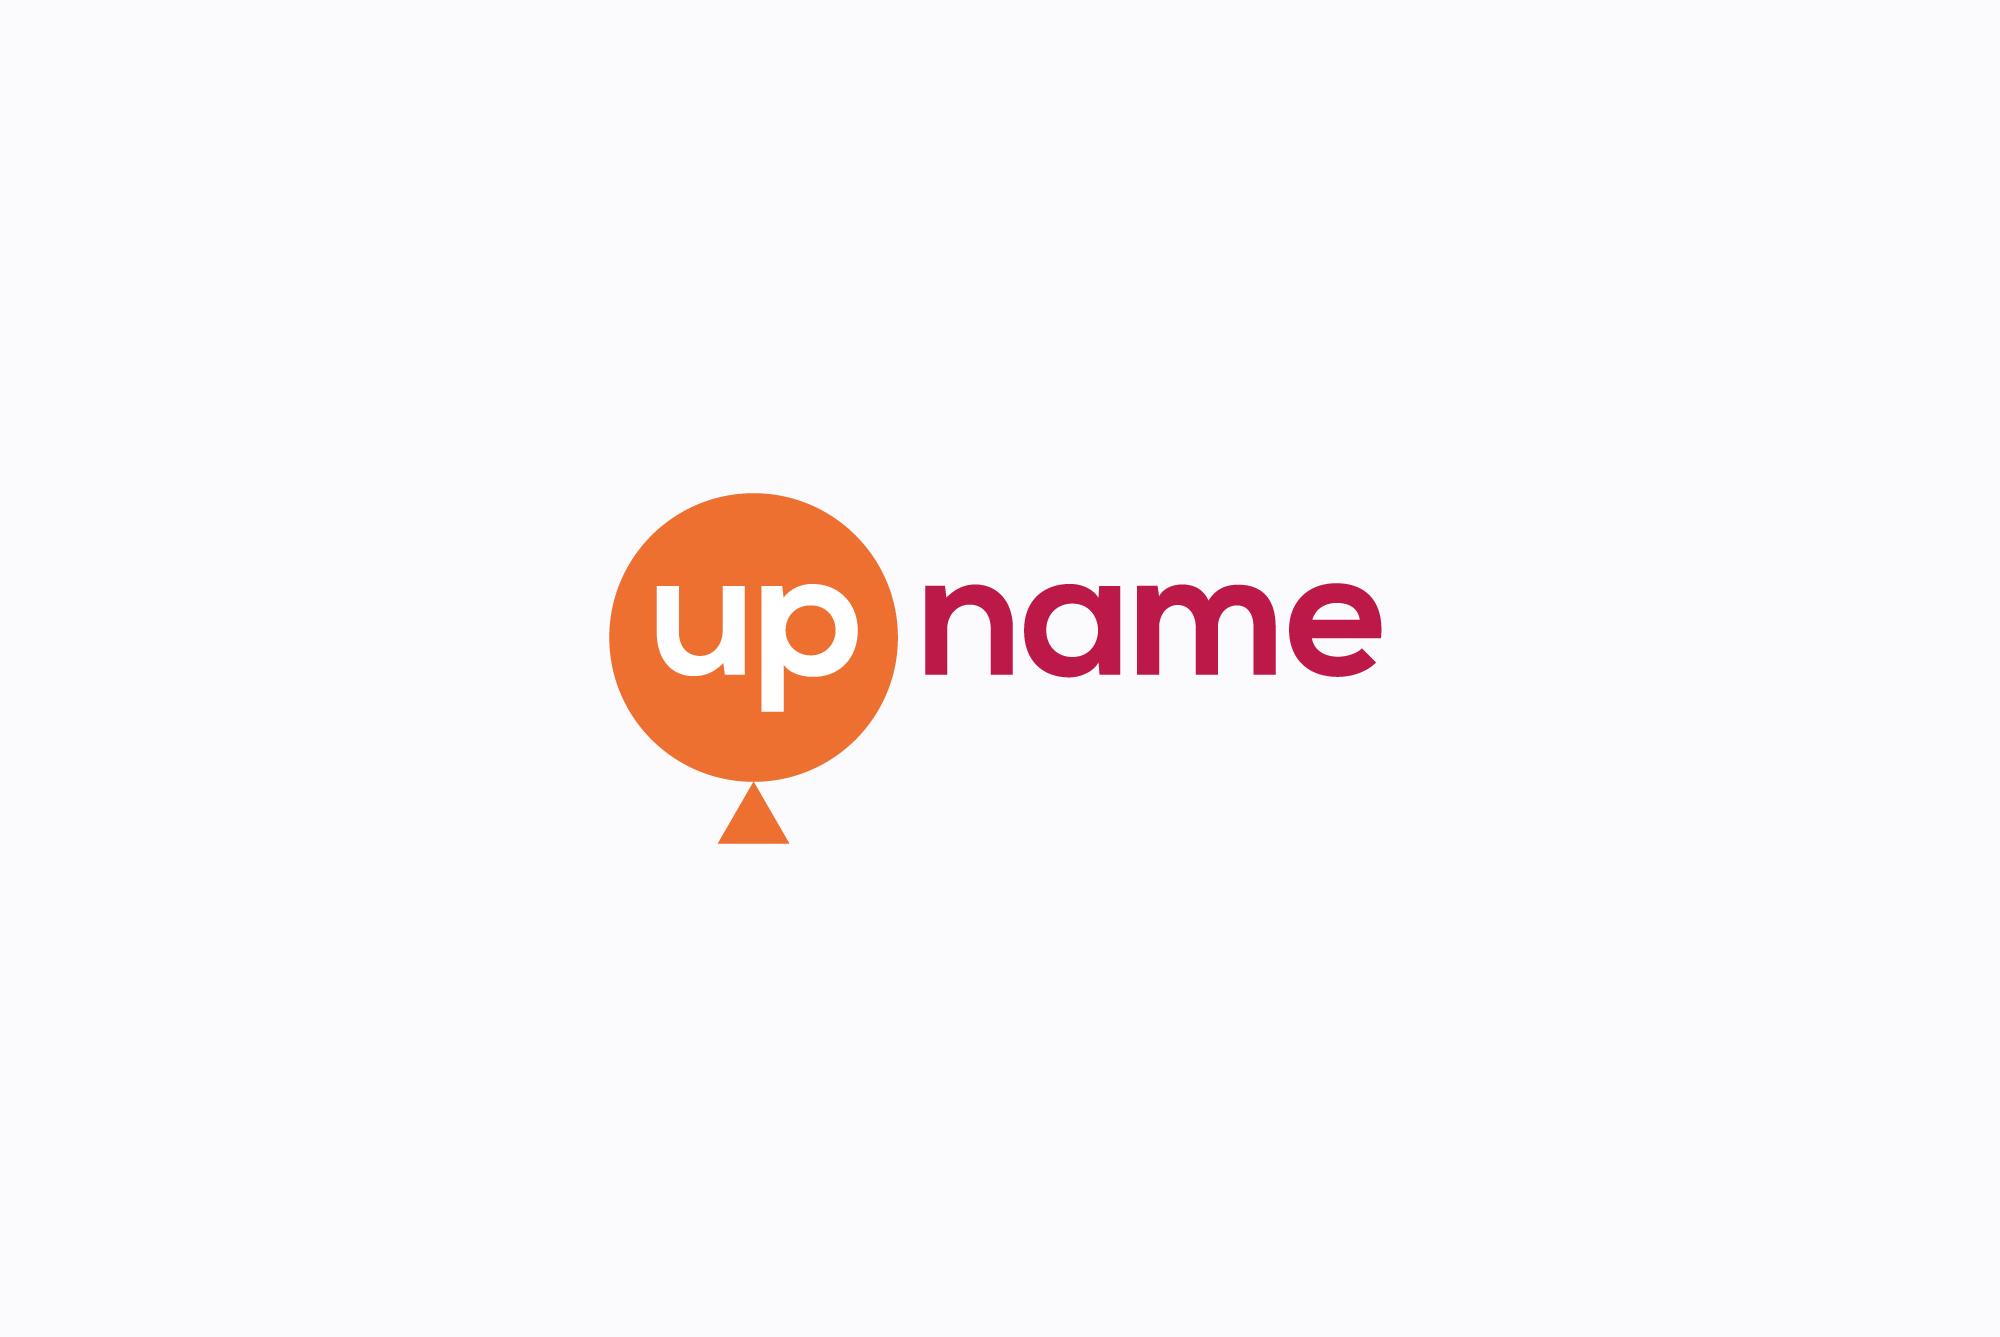 UP name logo example image 1